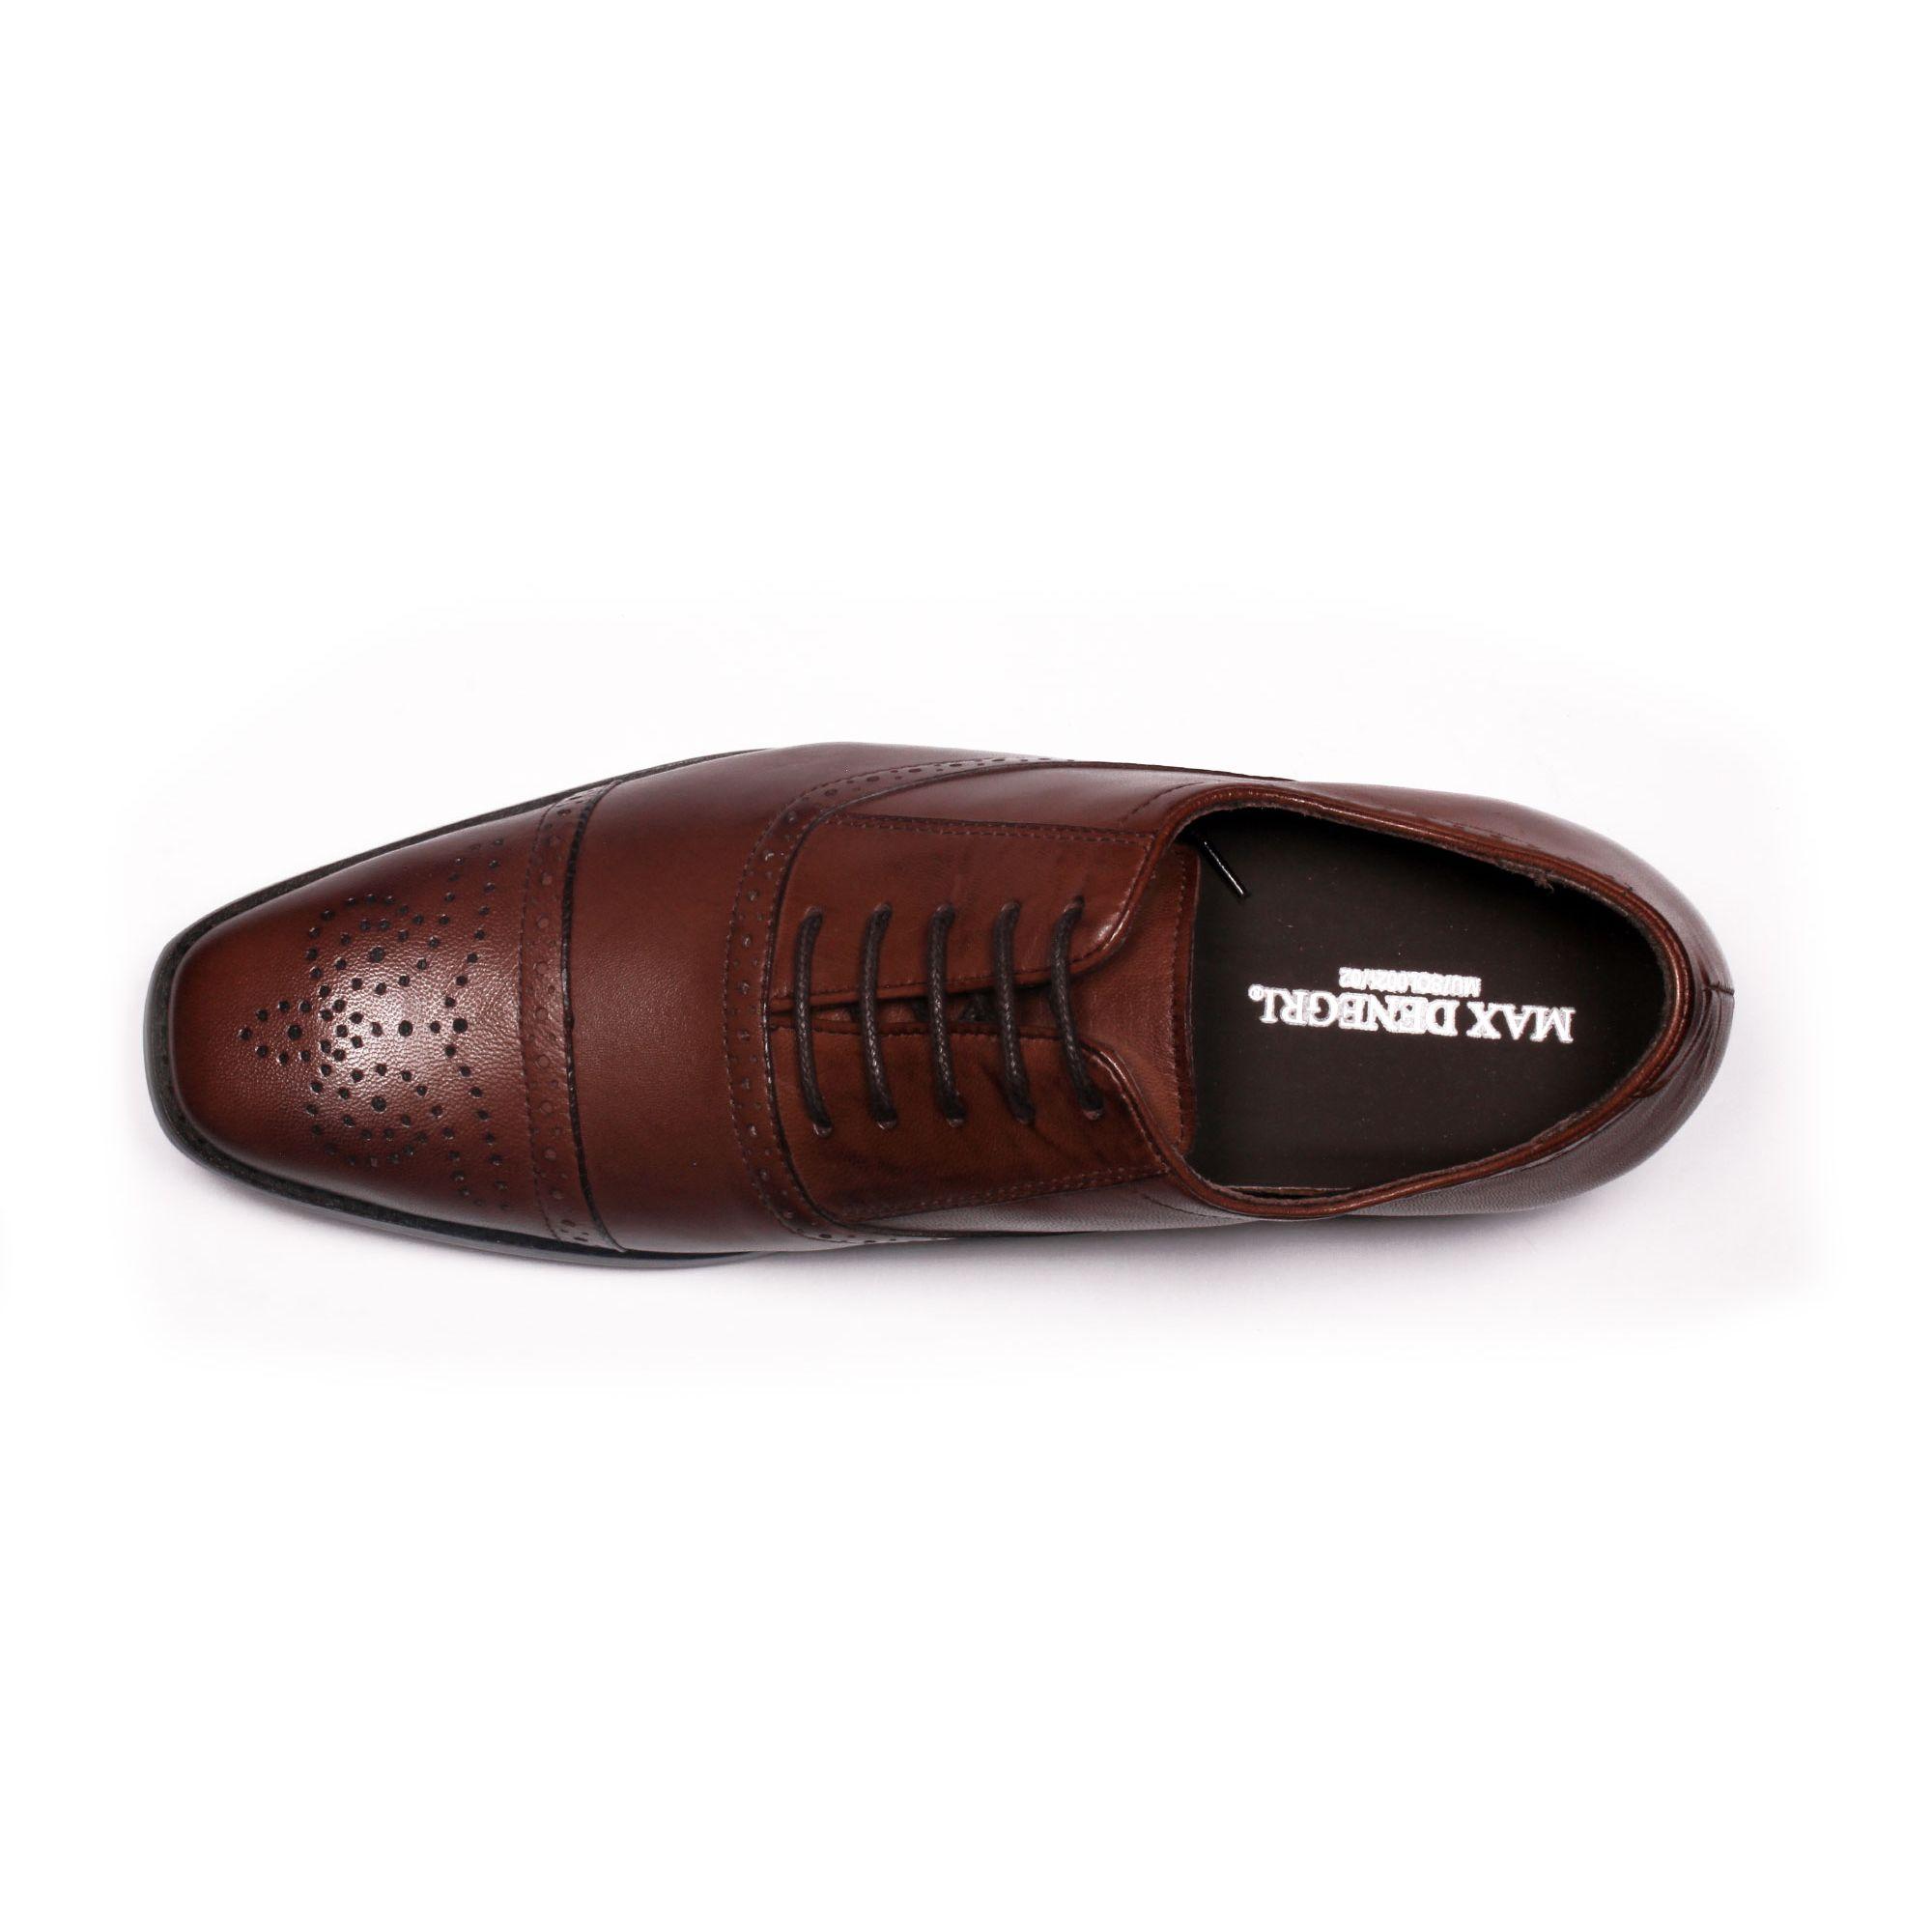 Zapato Formal British Café Max Denegri +7cms de Altura_70786